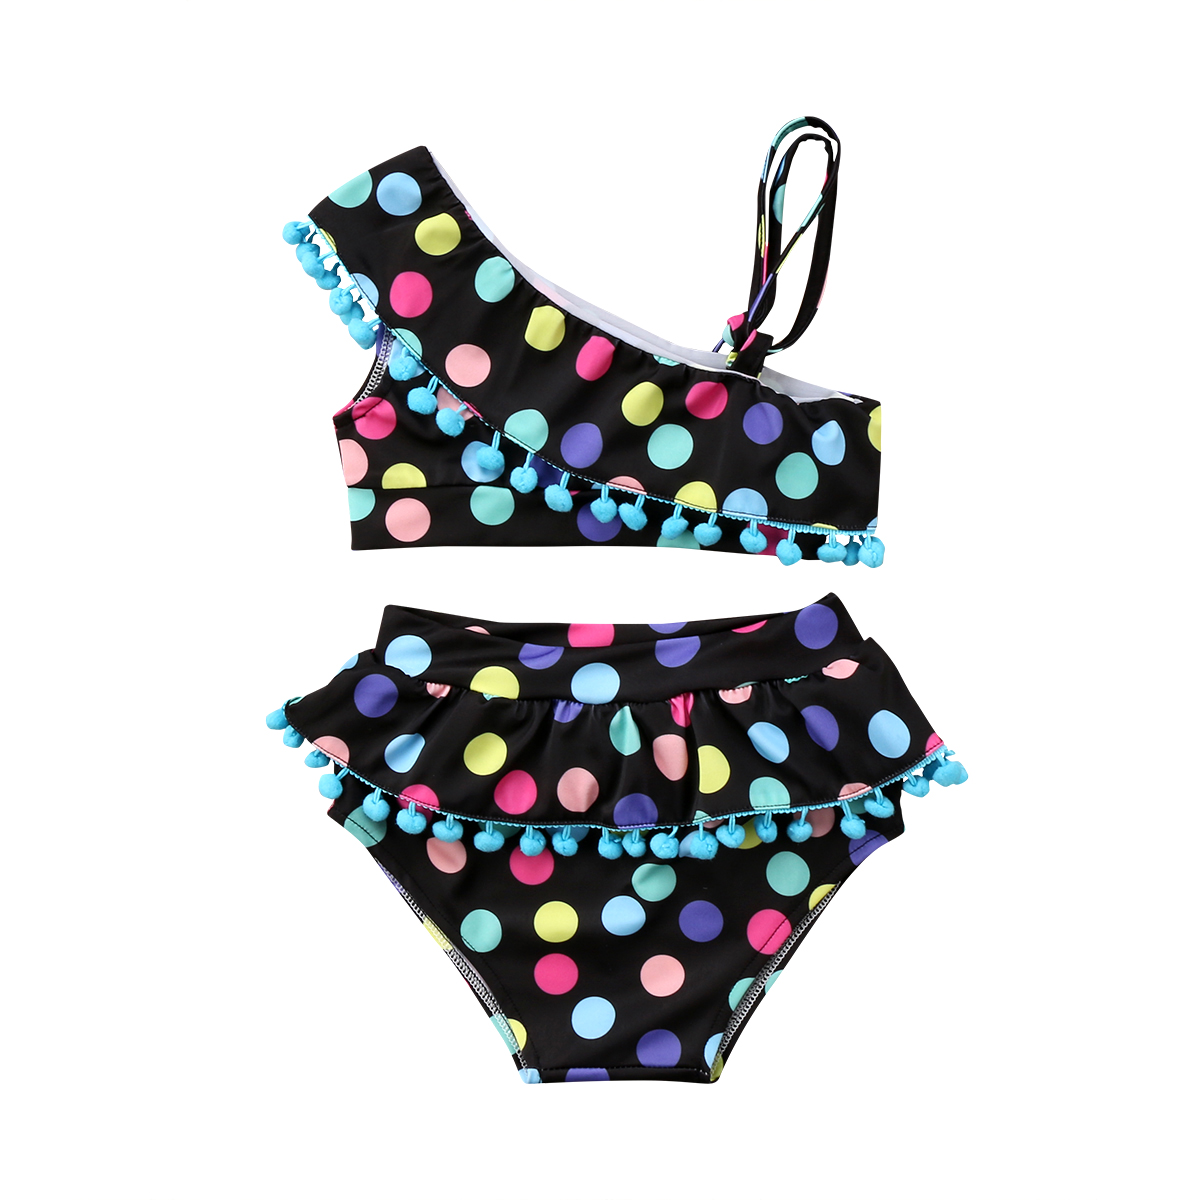 Toddler Baby Girls Kid Clothes Sets Tassel Tops Bodysuits Bottoms Swimsuit Tankini Bikini Swimwear Beachwear 2pcs Girl 2-7T